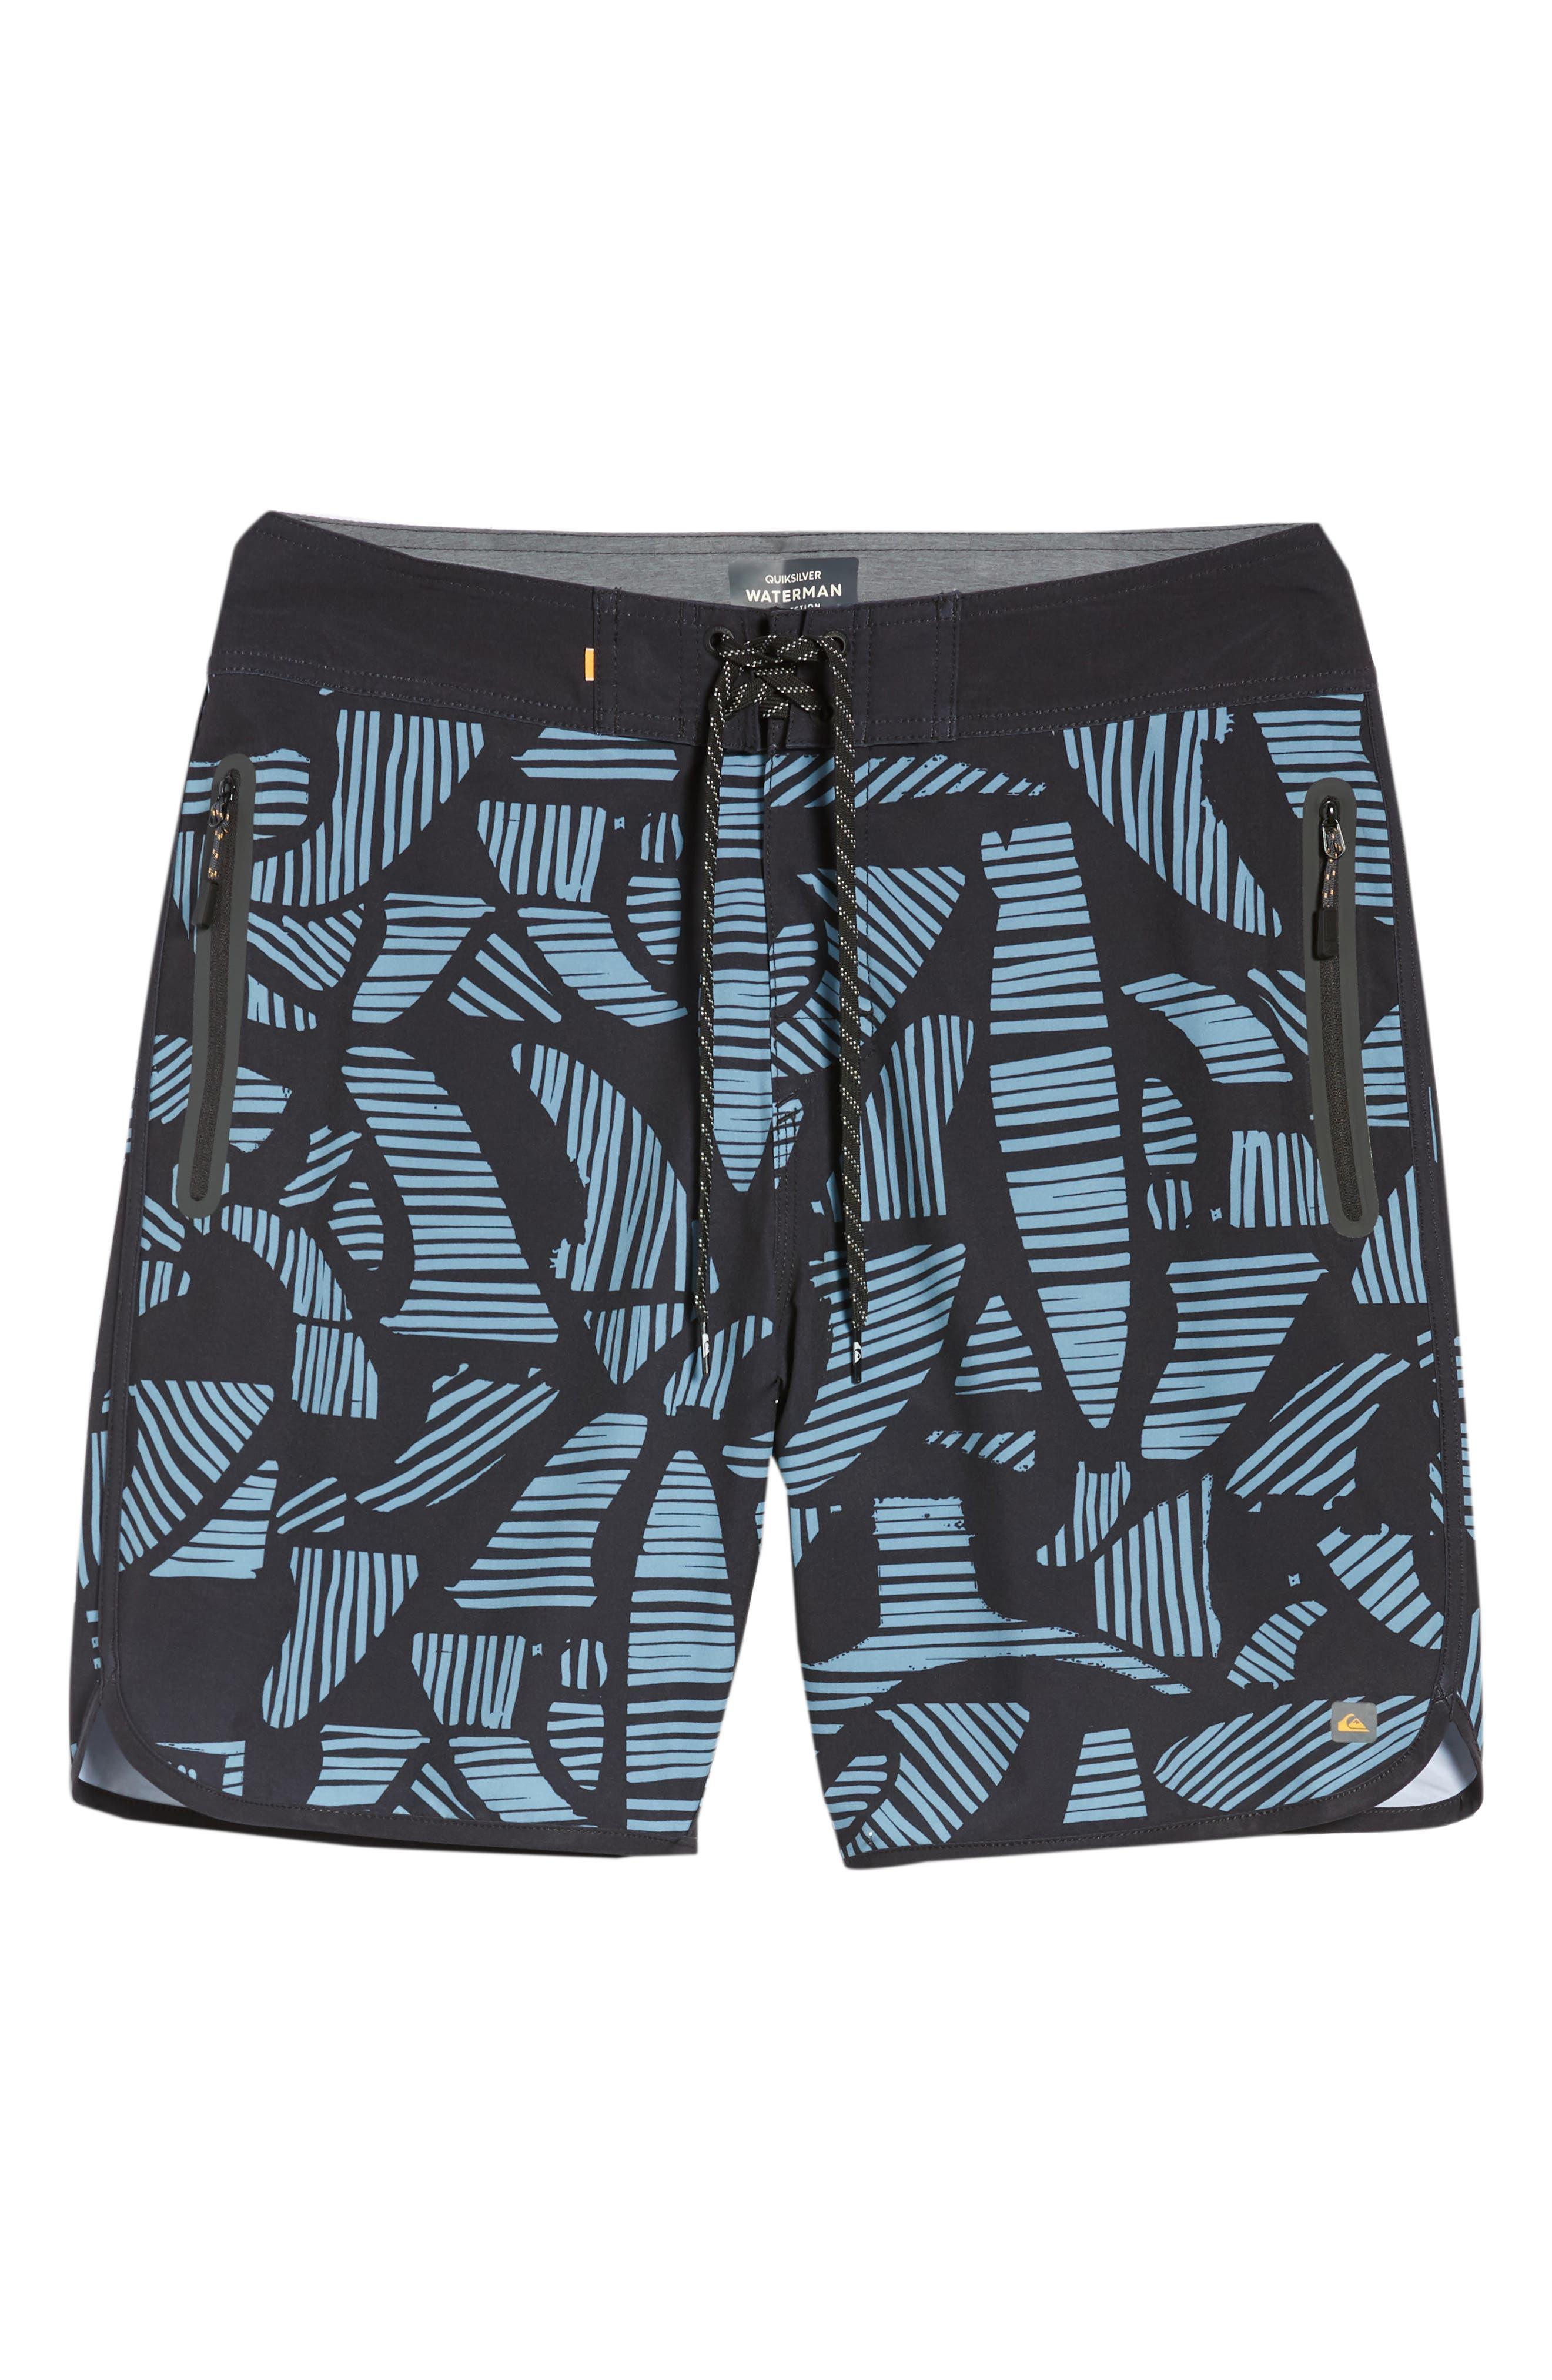 Odysea Board Shorts,                             Alternate thumbnail 6, color,                             002